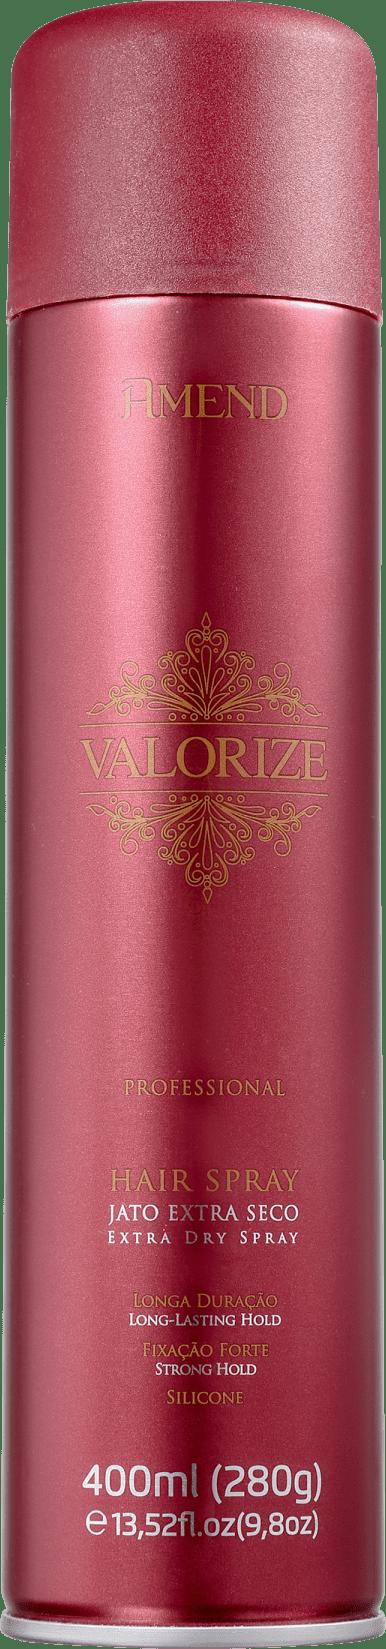 Spray Fixador Forte Valorize Amend 400ml